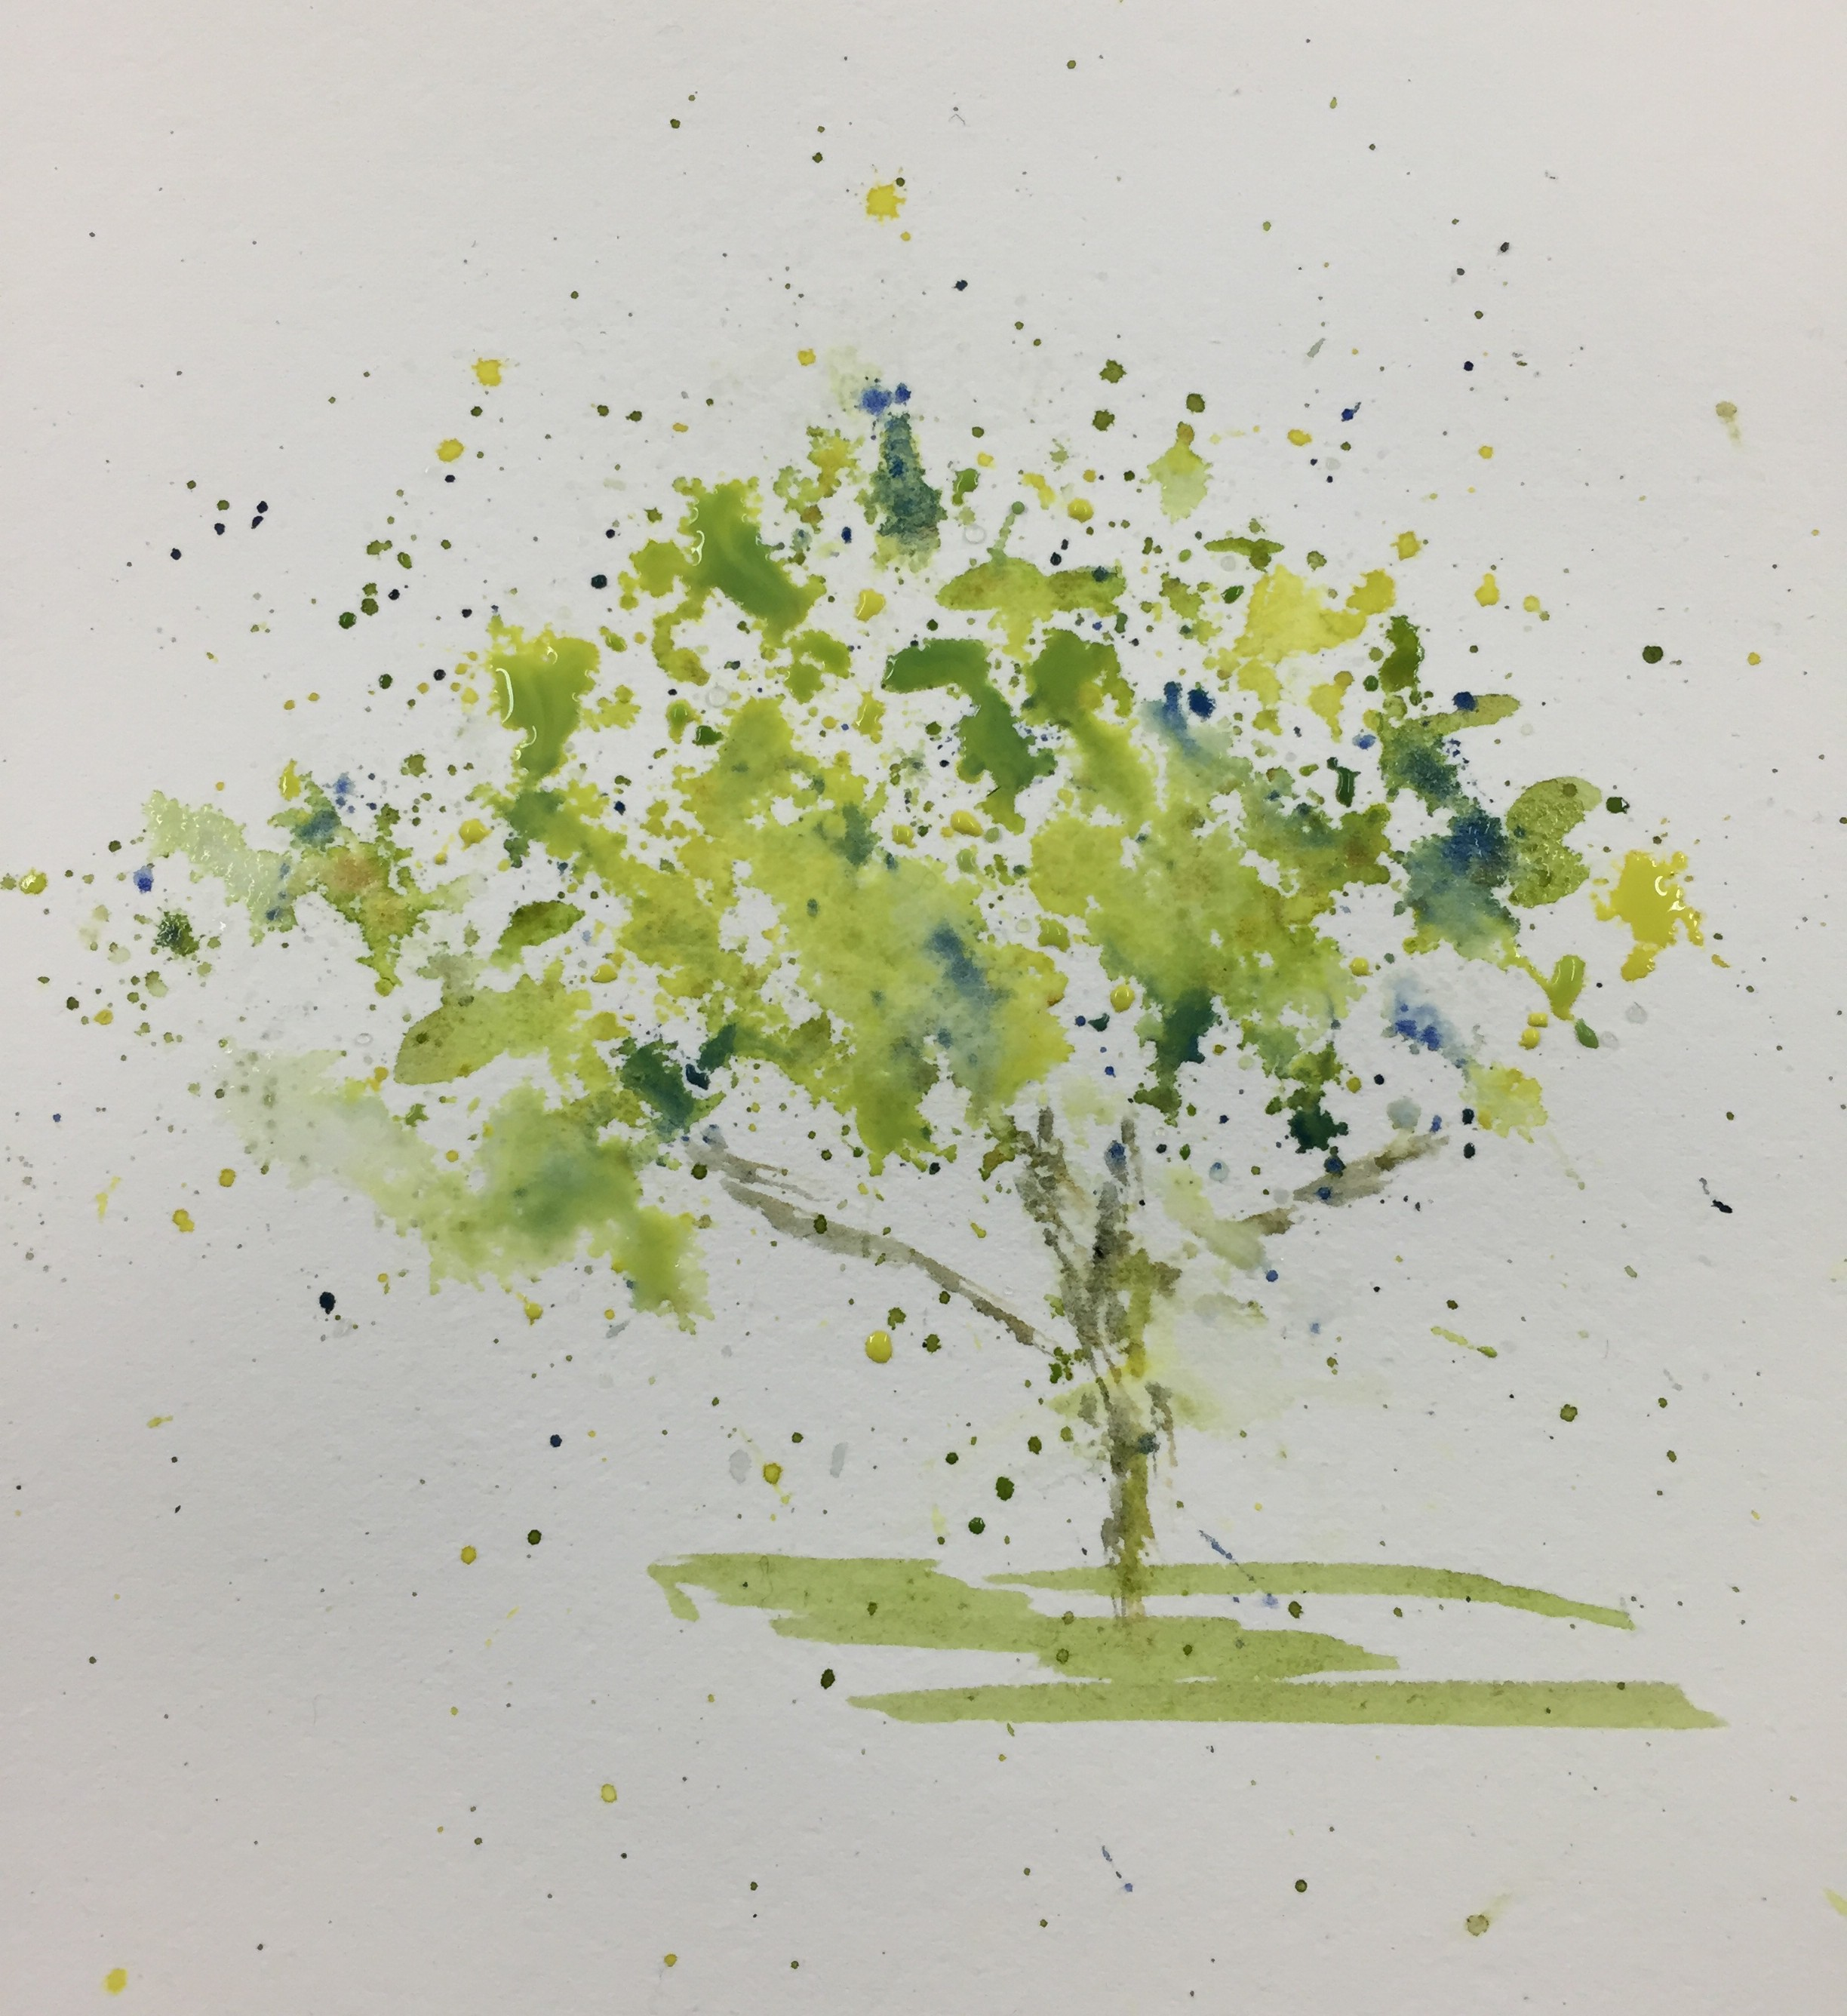 watercolor trees | Carol King: drawing, painting, complaining